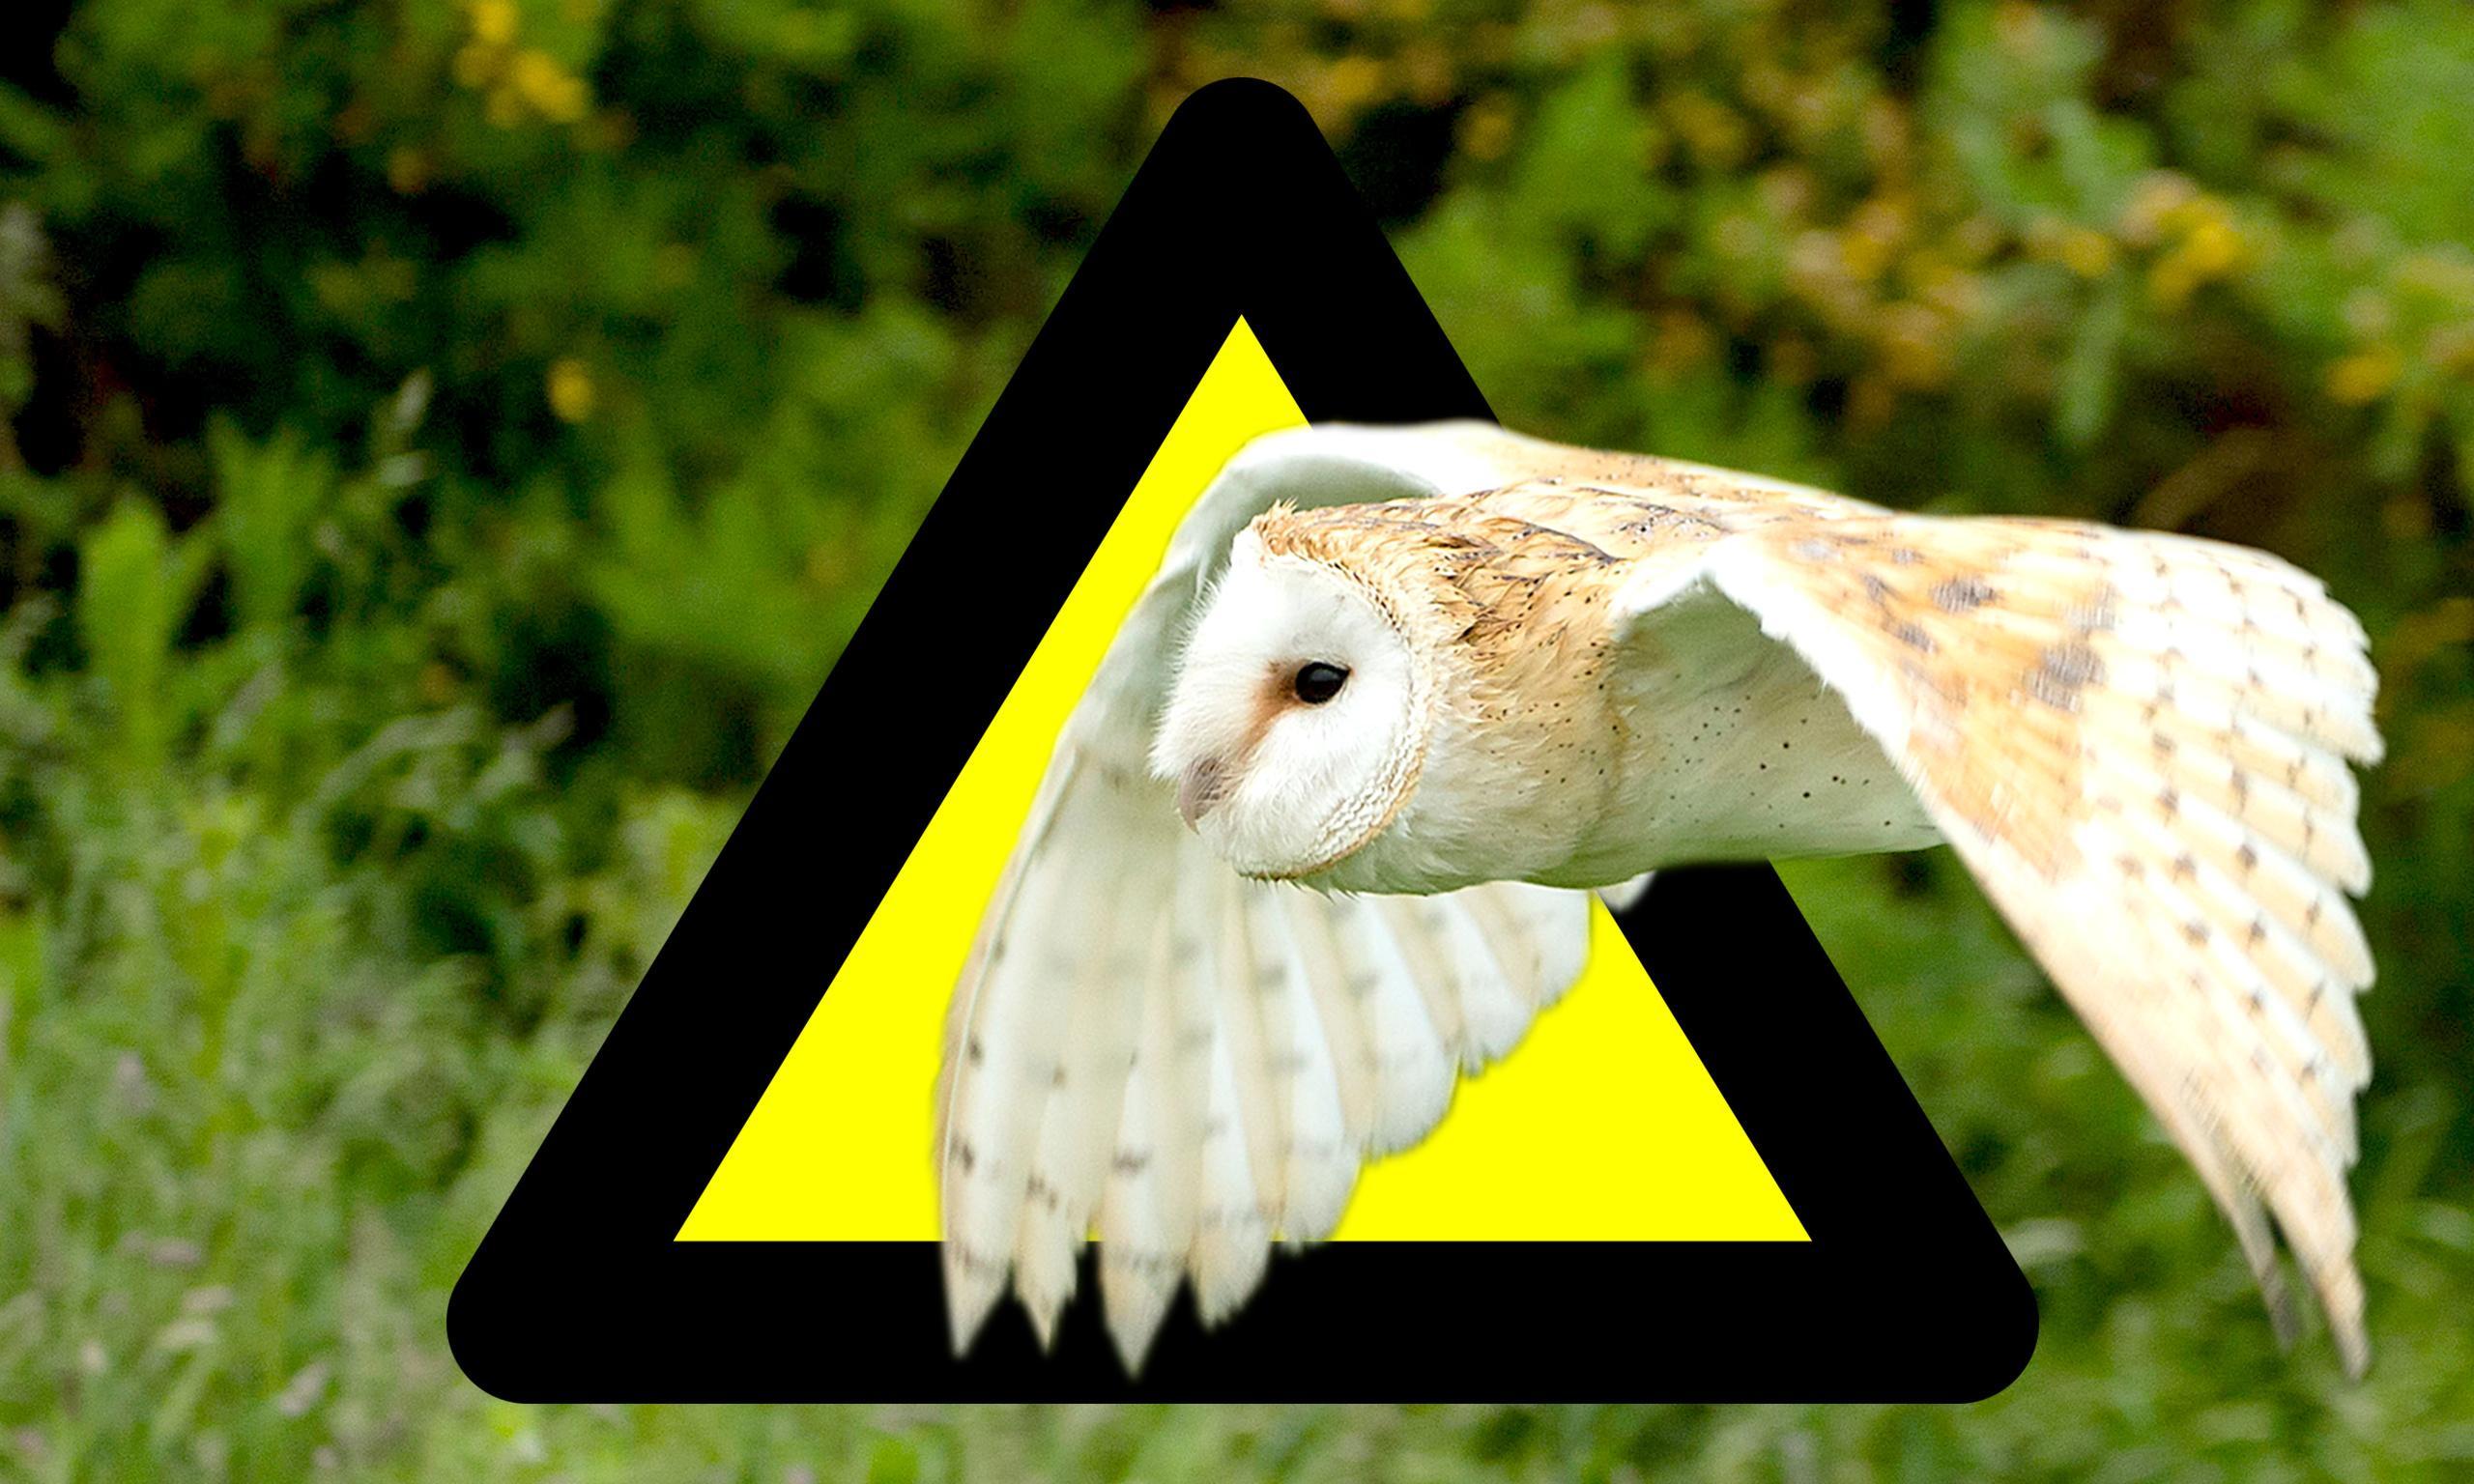 HS2 will destroy or damage hundreds of UK wildlife sites, says report